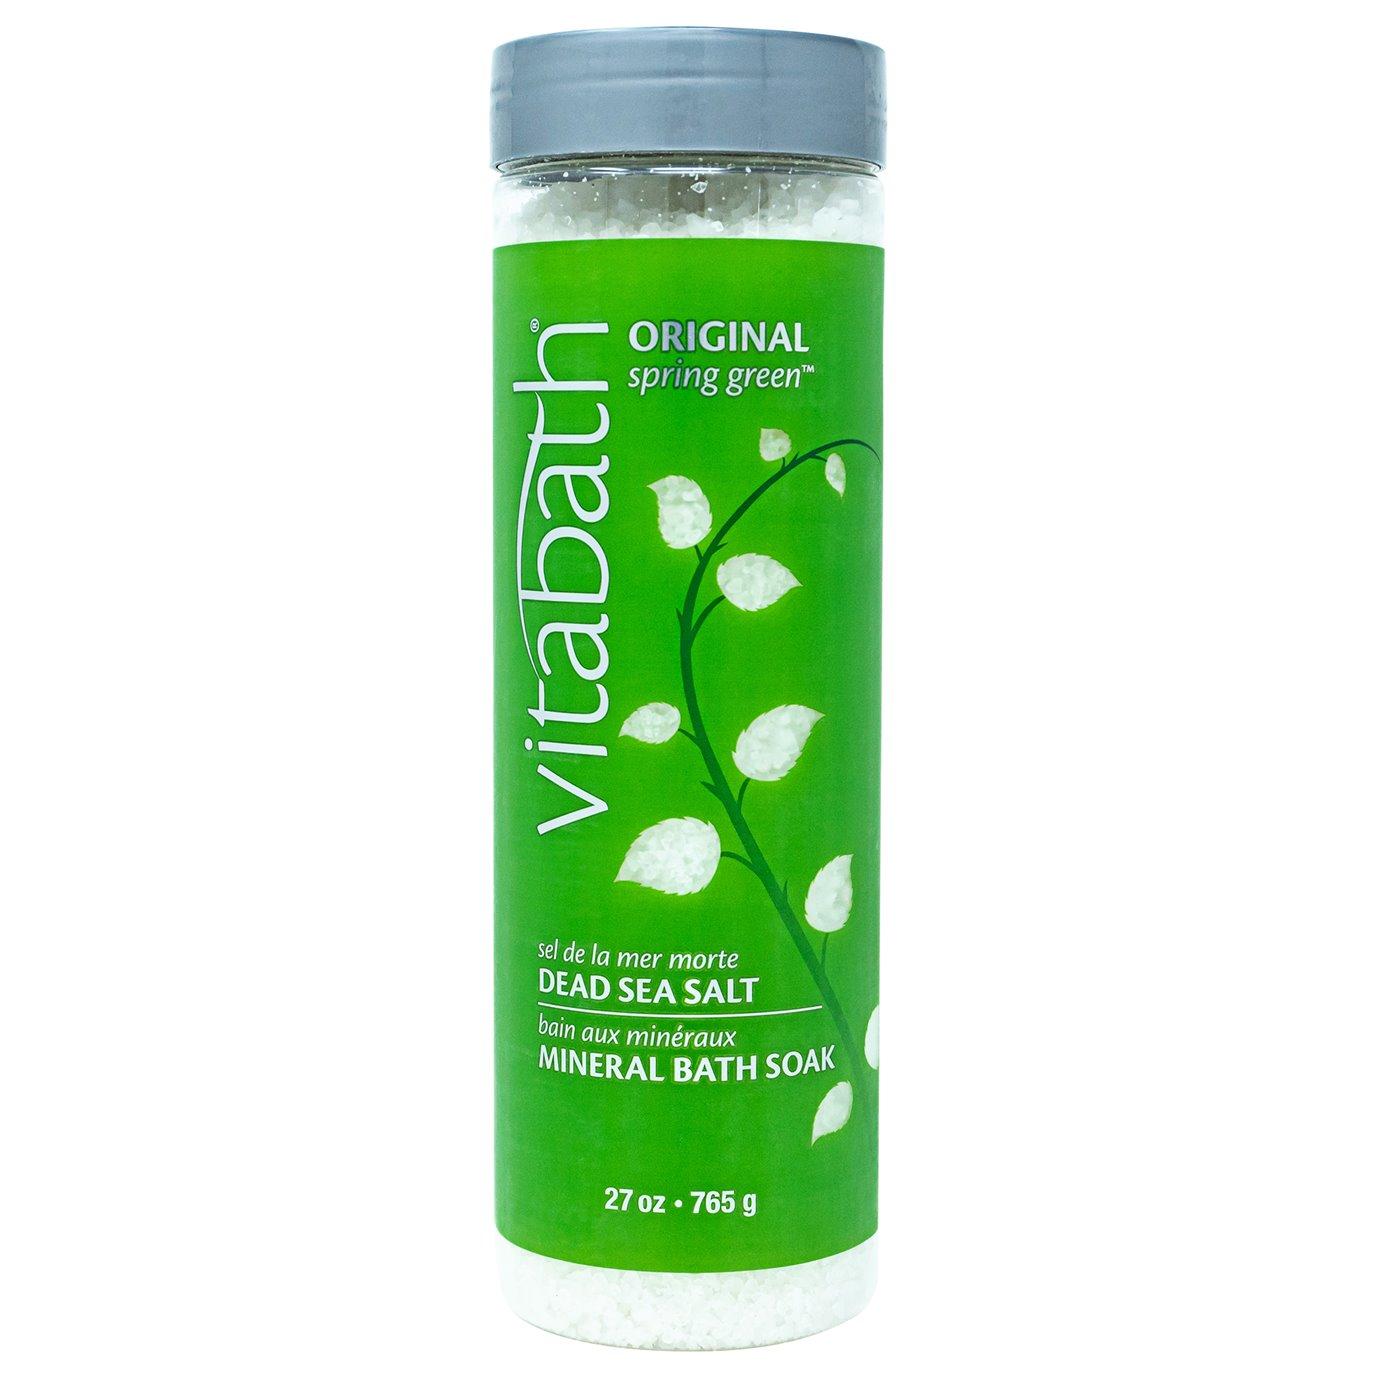 Vitabath Original Spring Green Dead Sea Salt Mineral Bath Soak